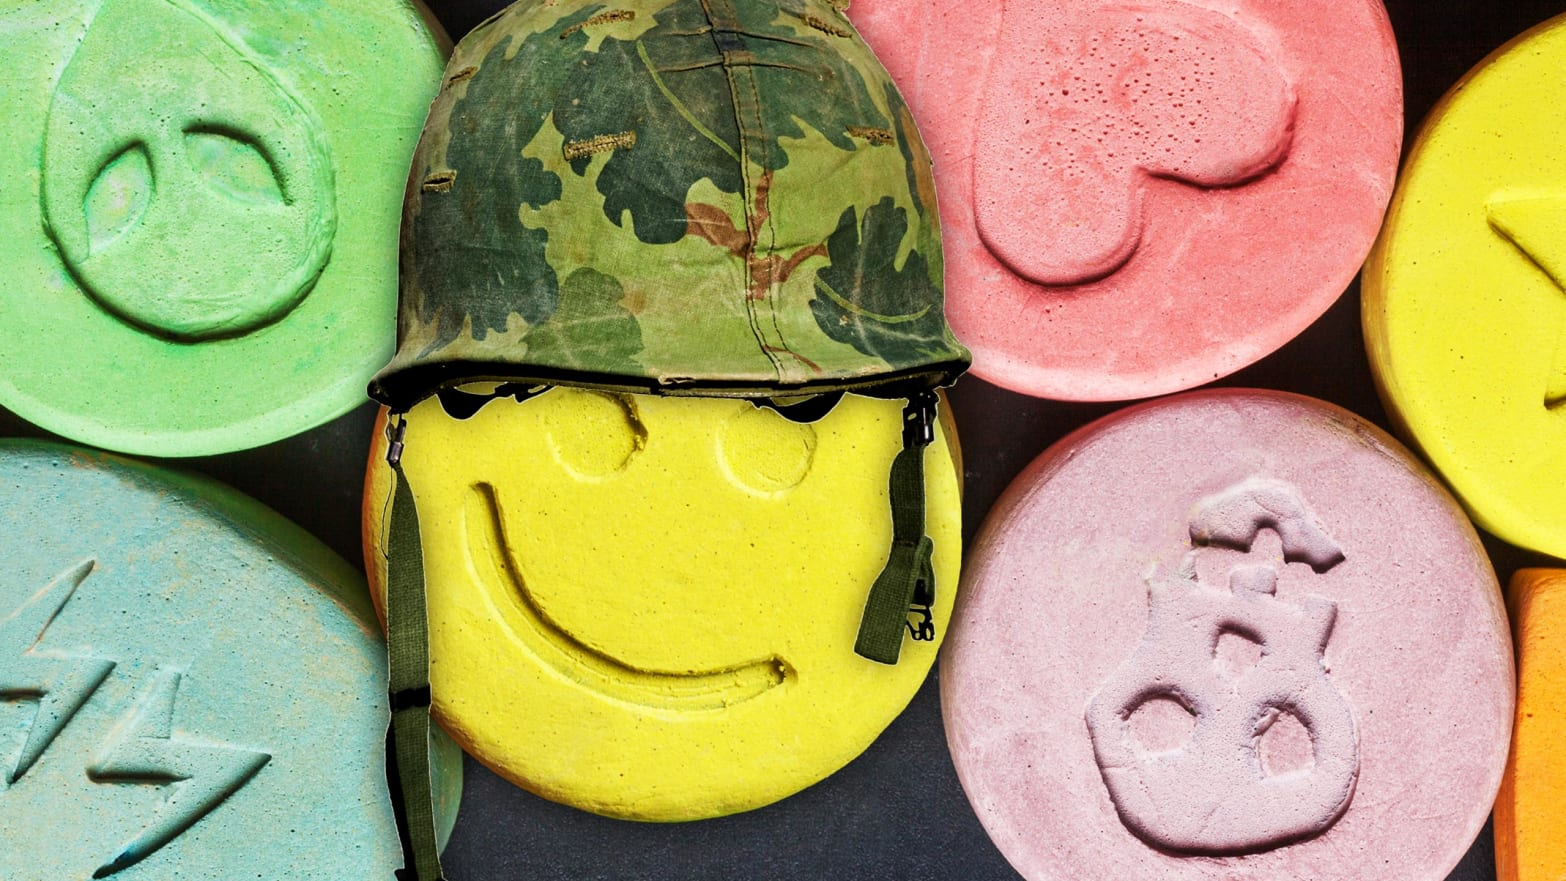 veteran mdma ecstasy ptsd post traumatic posttraumatic stress disorder veteran vet iraq war military maps fda